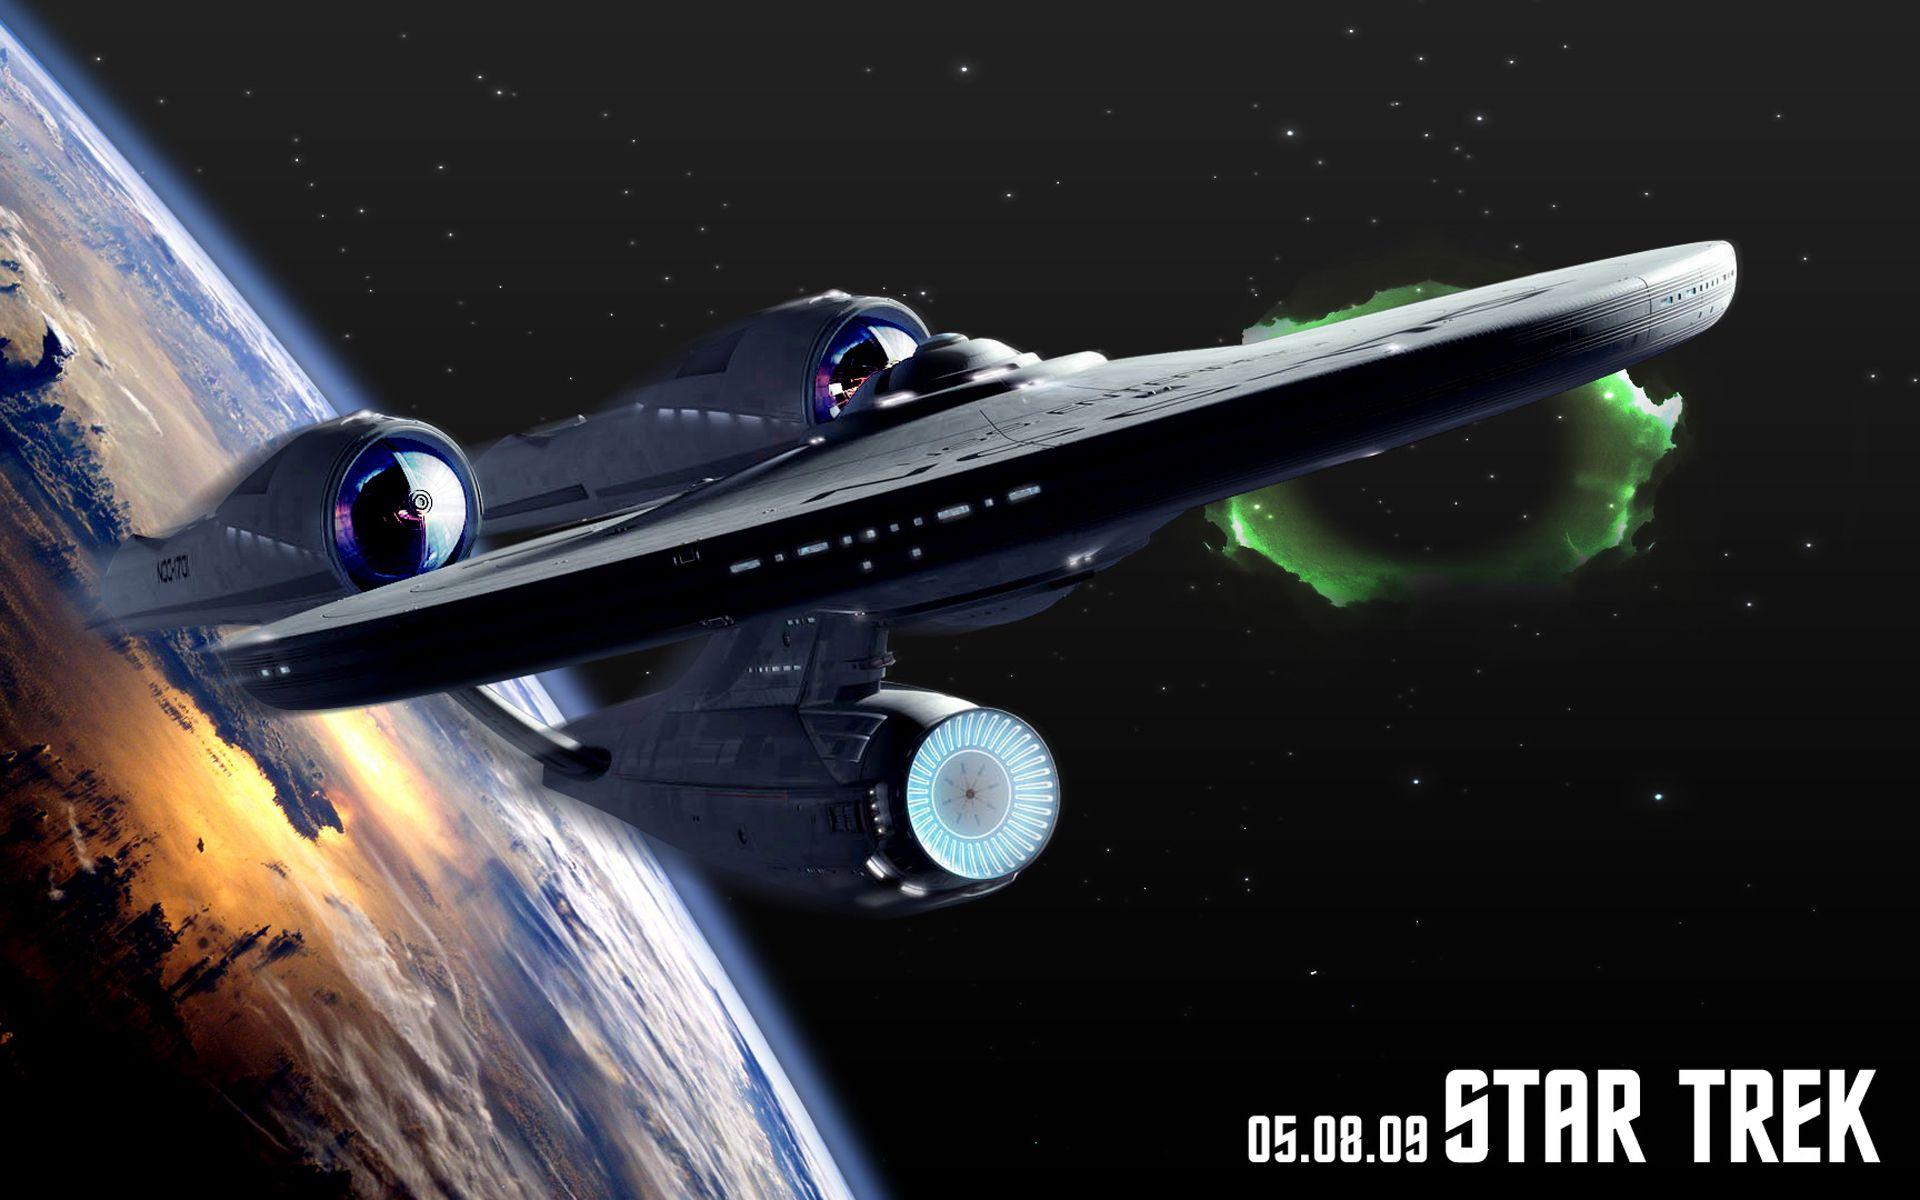 Starship Enterprise Wallpapers Best HD Desktop Wallpapers 1920x1200